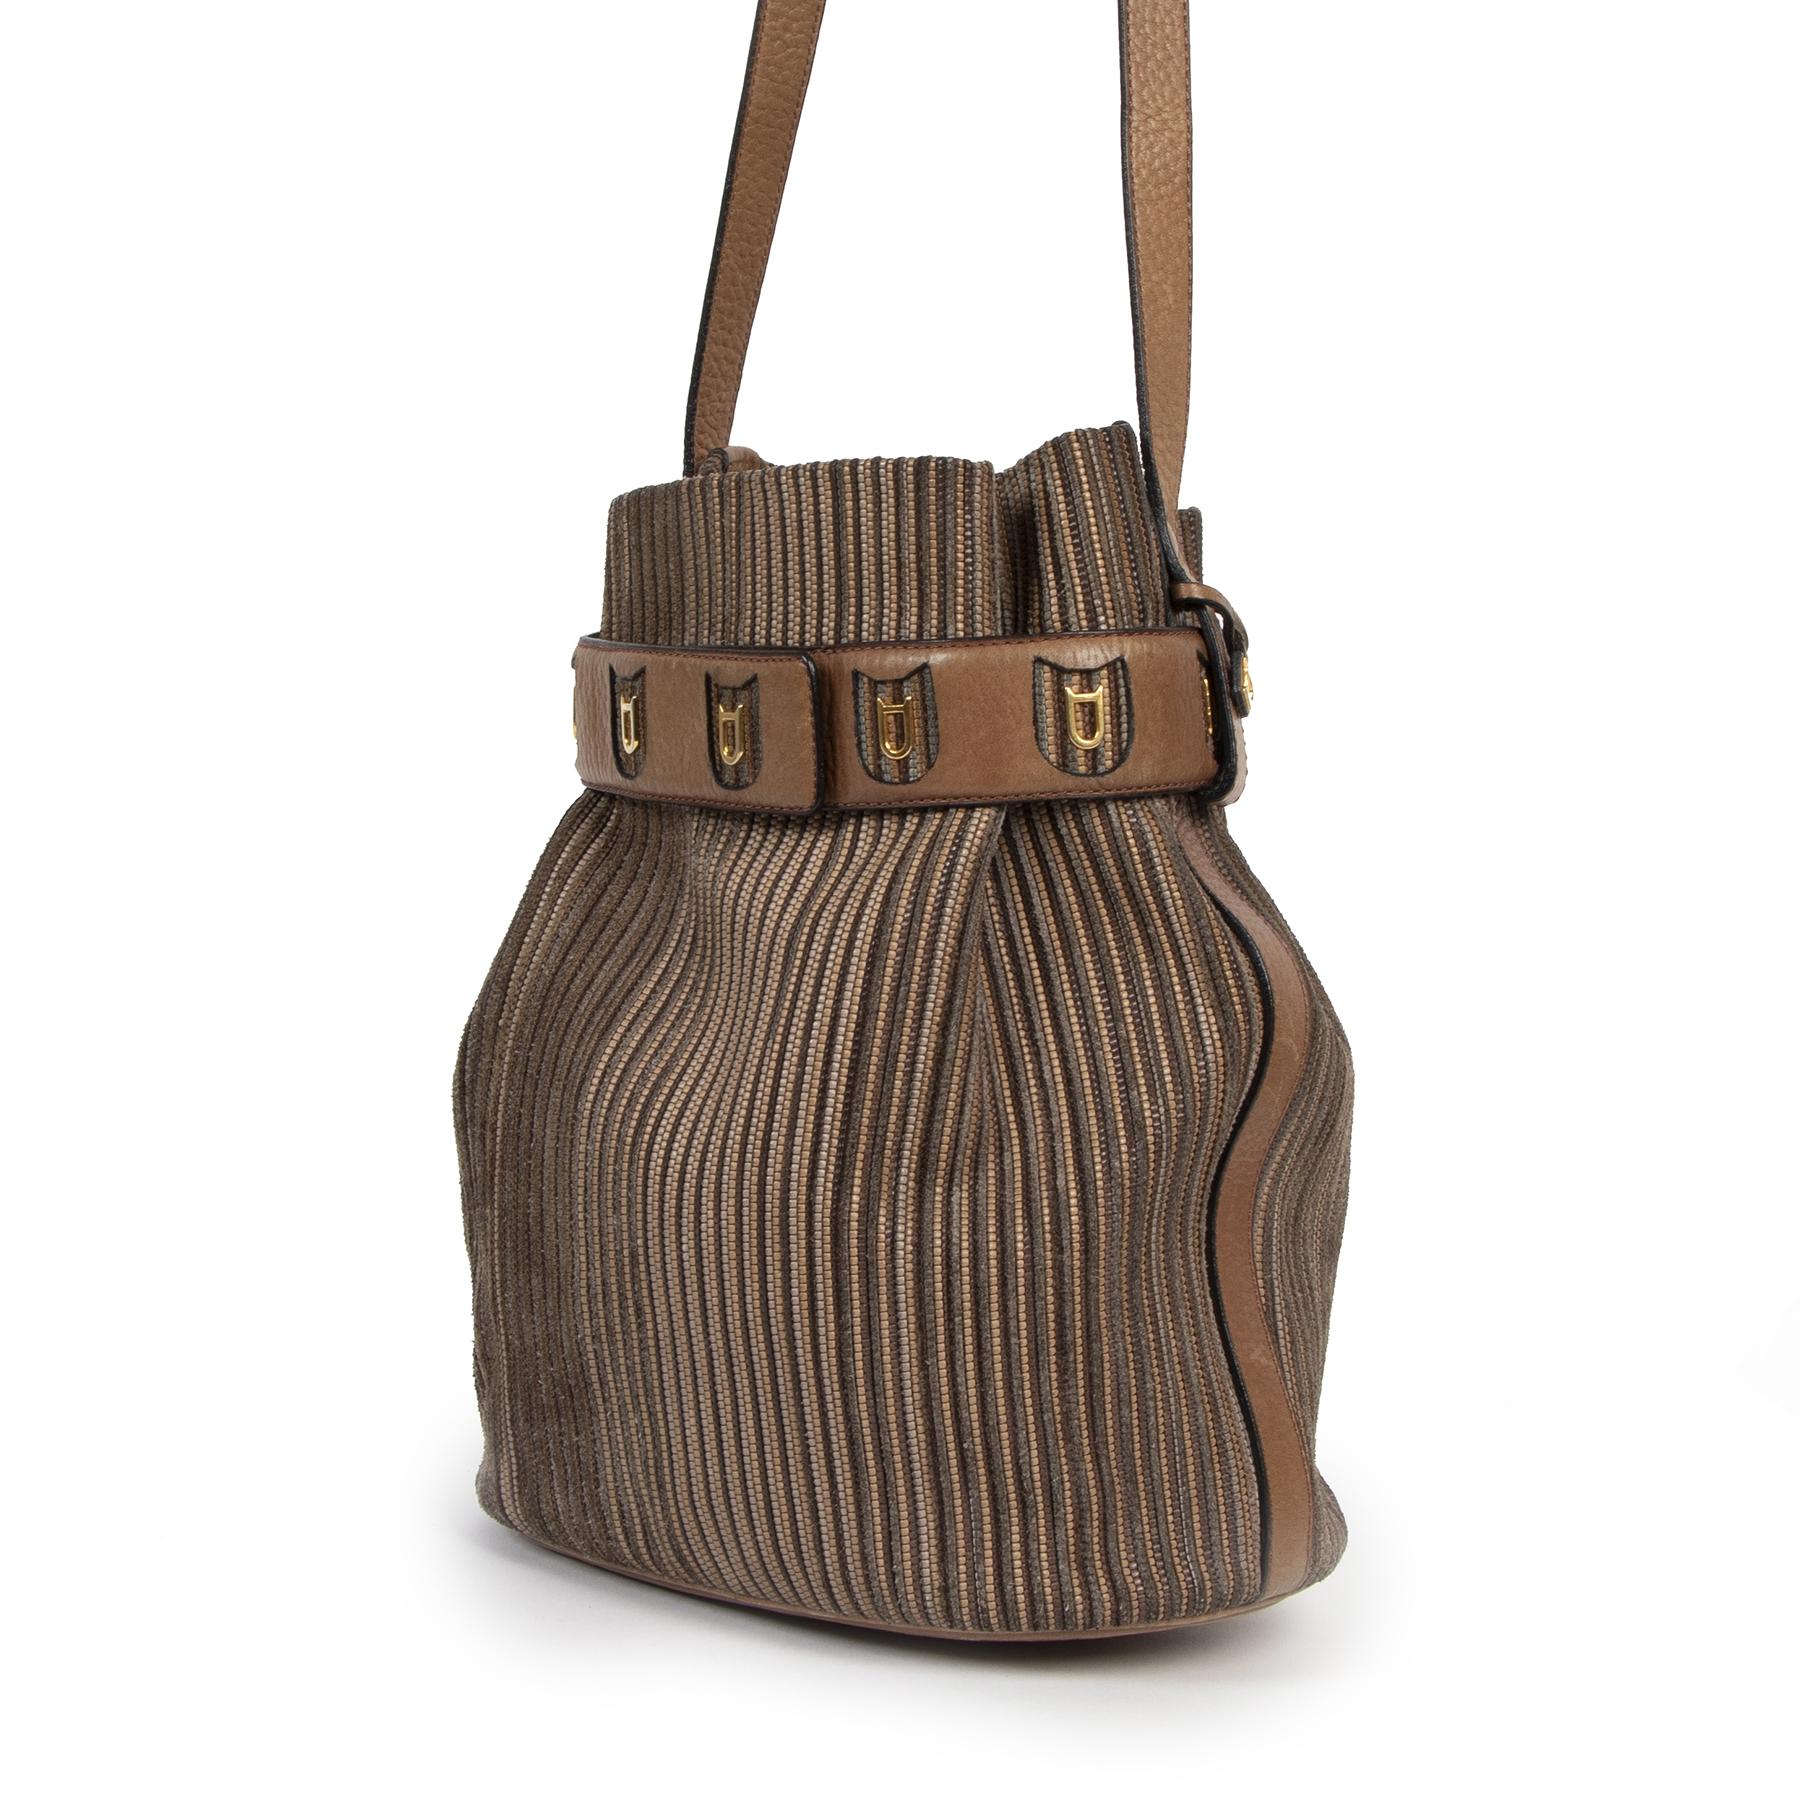 Buy authentic secondhand Delvaux 'Toile De Cuir' bucket bags at labelLOV Antwerp